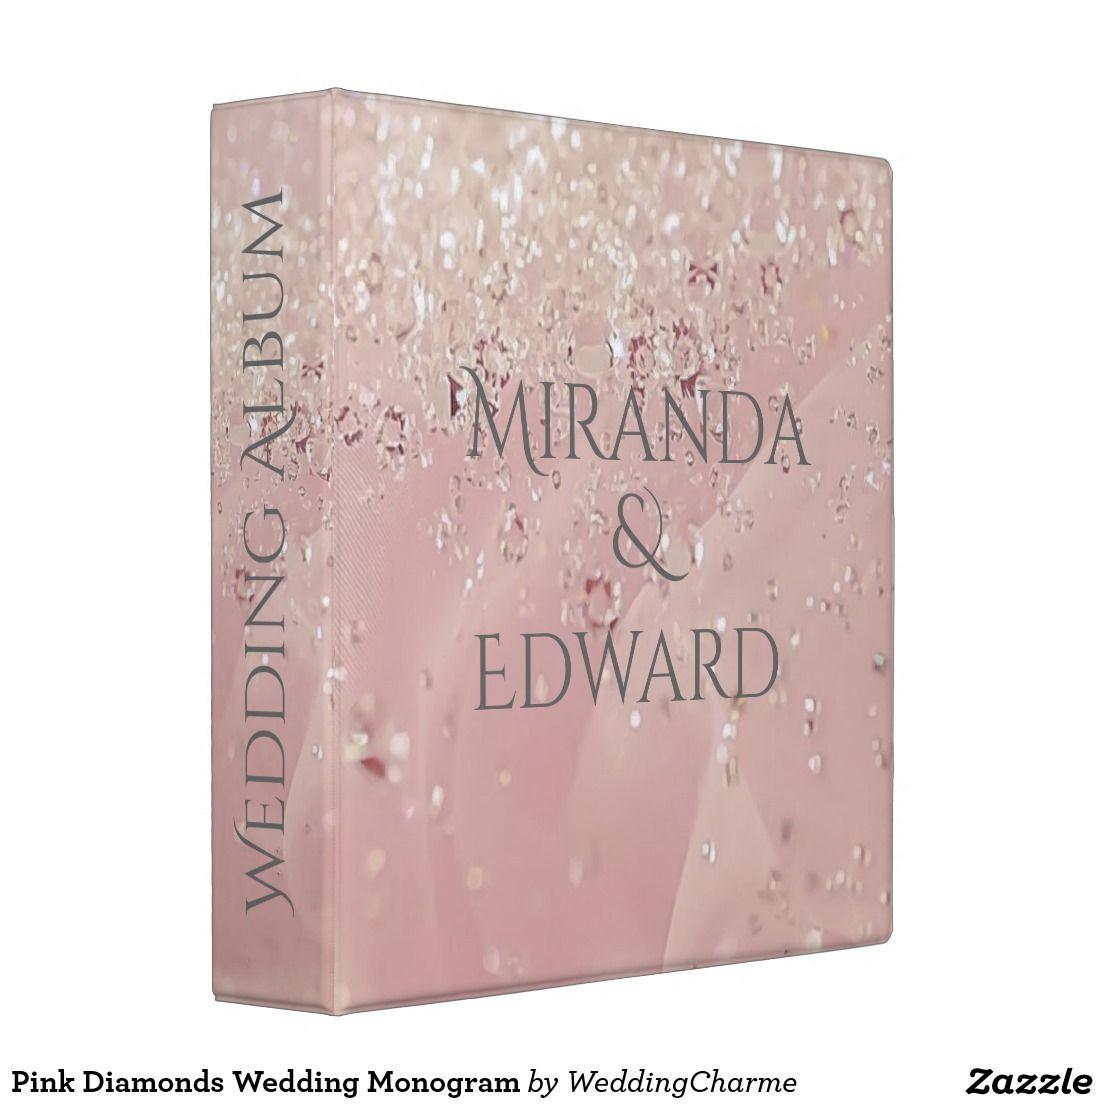 Pink Diamonds Wedding Monogram Album Binder   Pink Diamonds Wedding ...